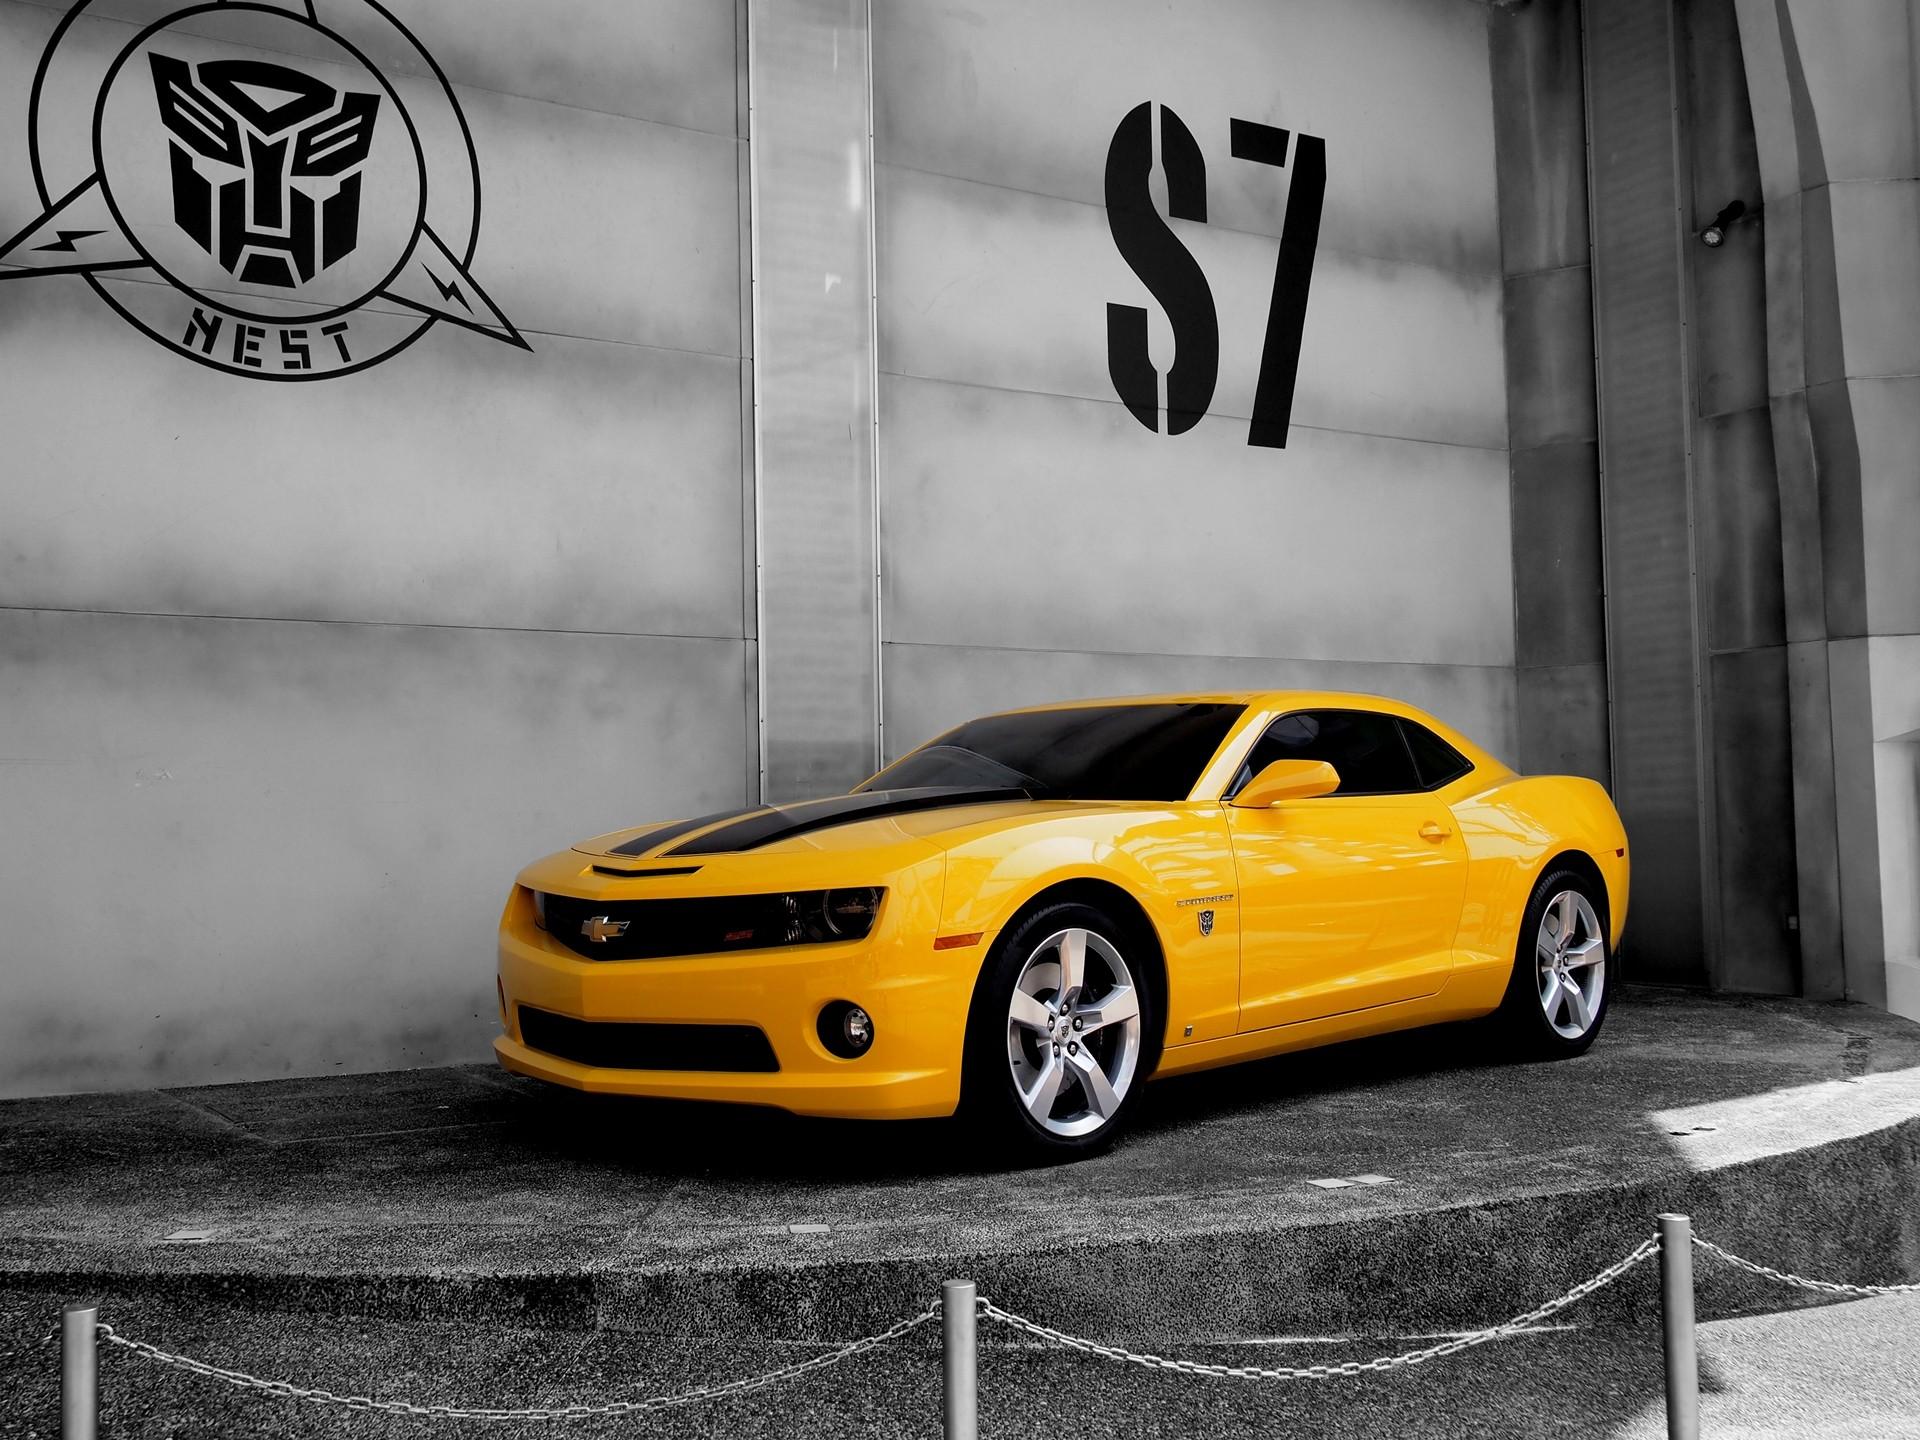 Bumblebee Car Wallpaper Download Camaro In Transformer Hd Cars 4k Wallpapers Images